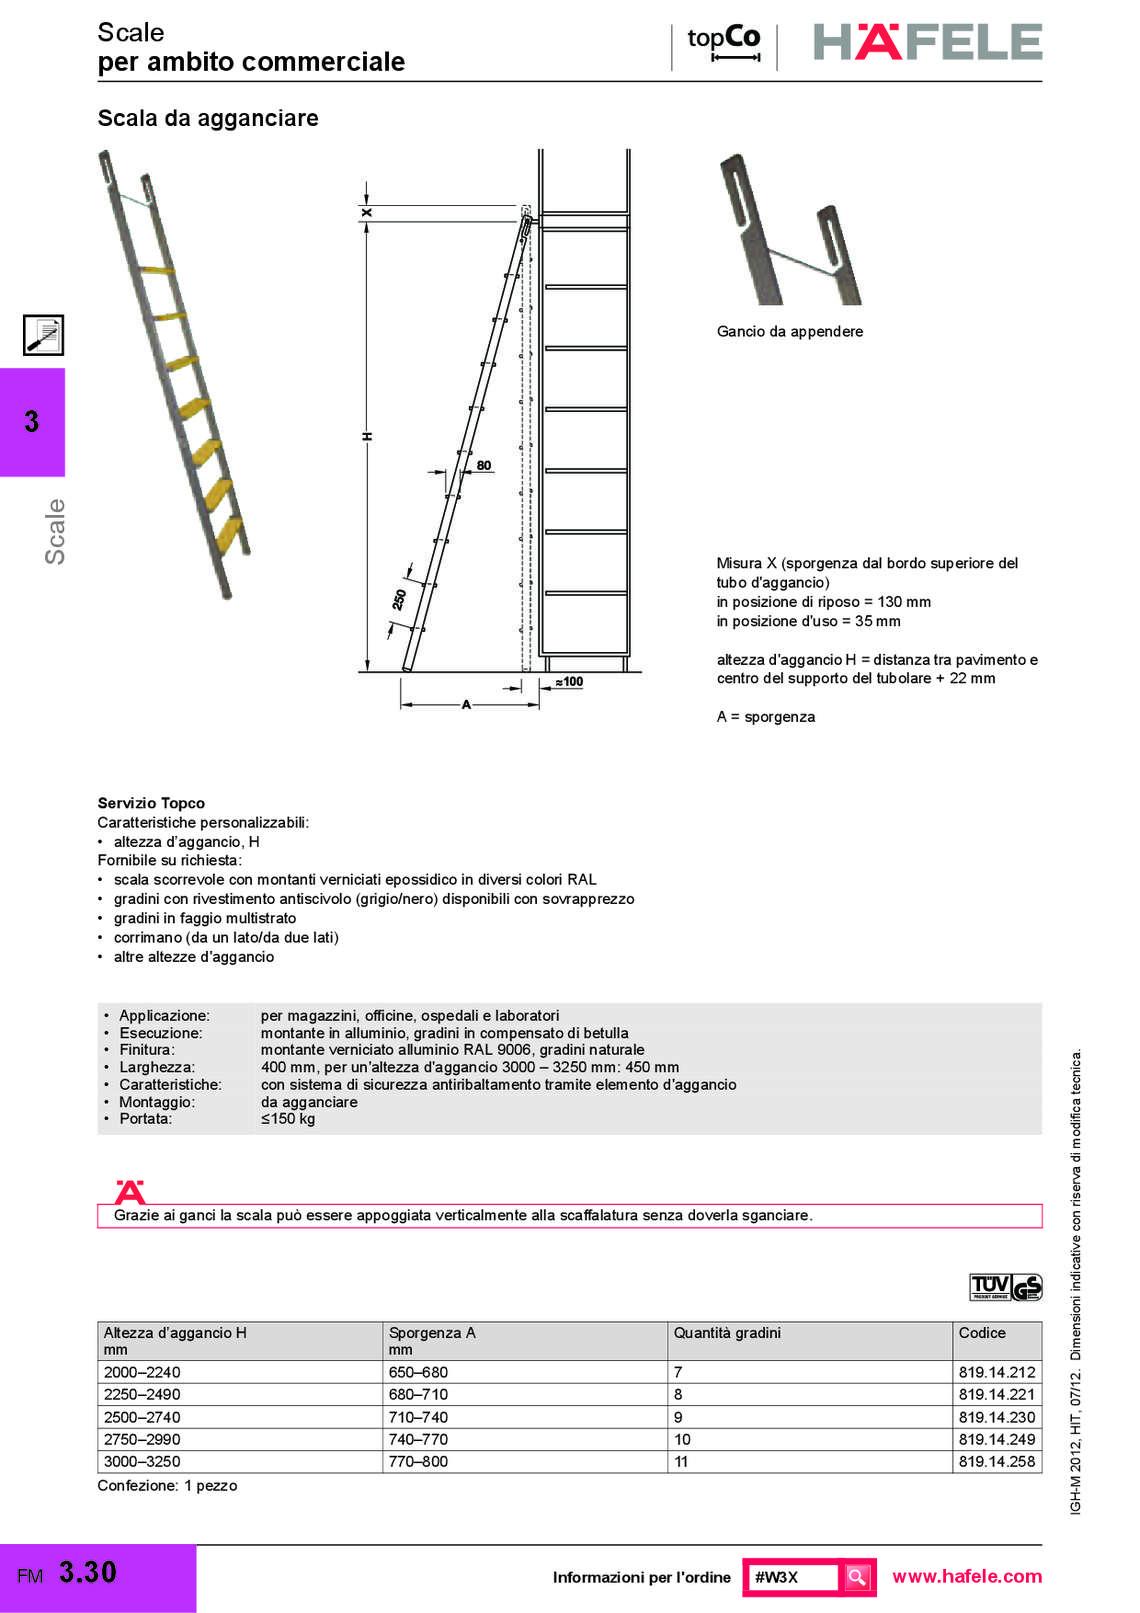 hafele-prodotti-su-misura_81_043.jpg